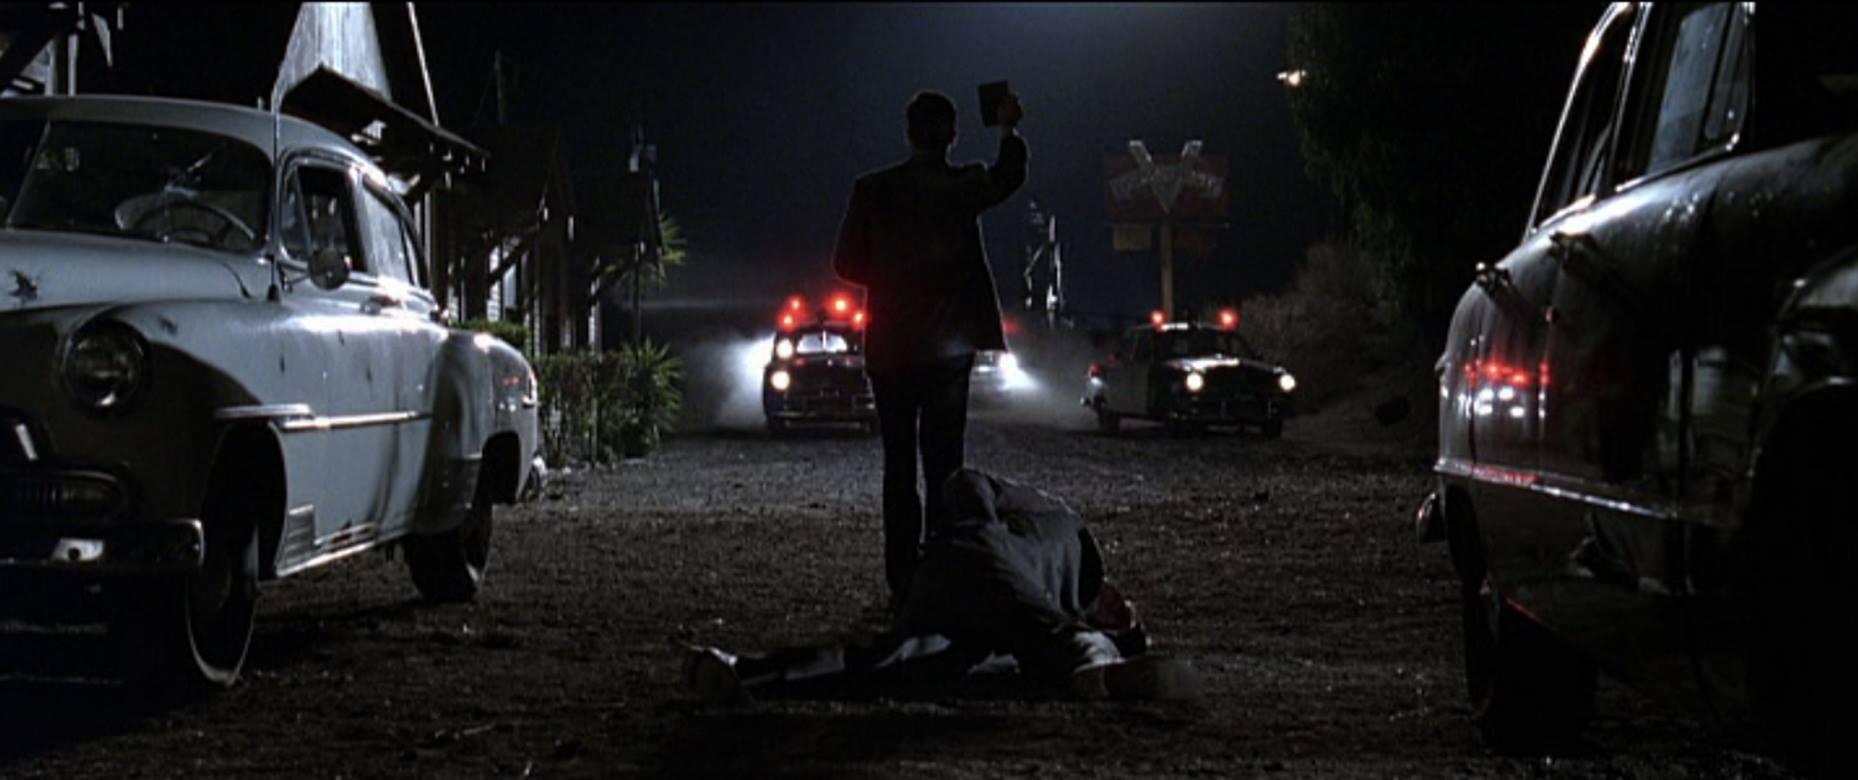 187. L.A. Confidential (1997)